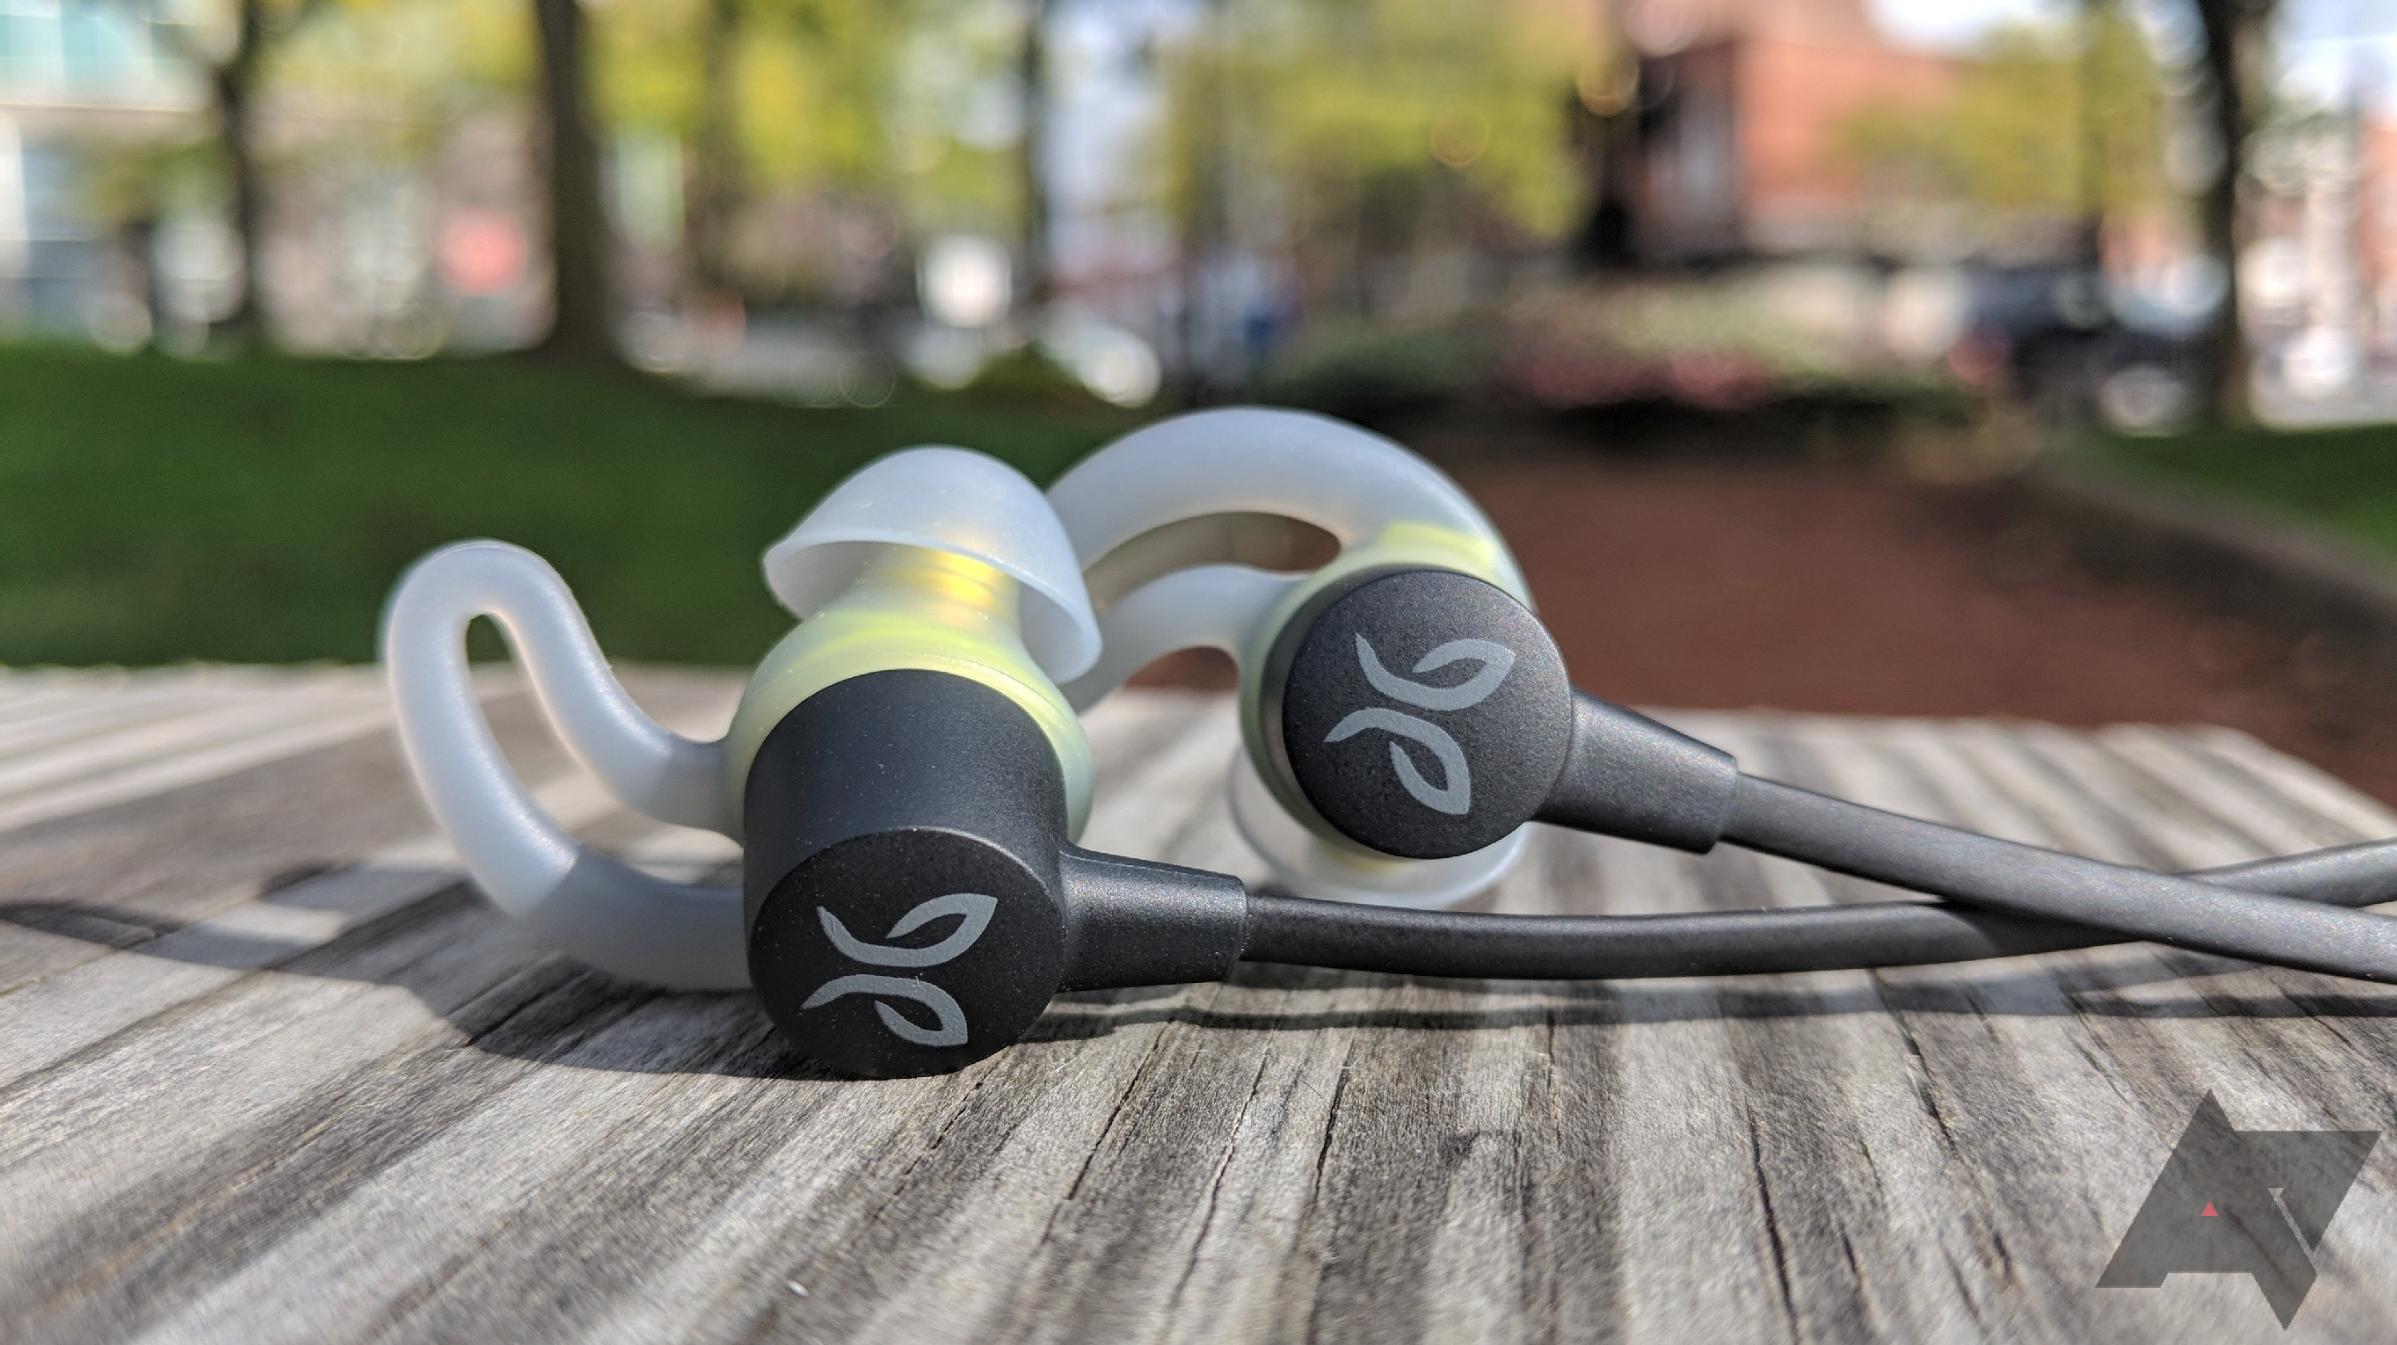 Jaybird Tarah wireless sport earbuds are 50% off at just $50